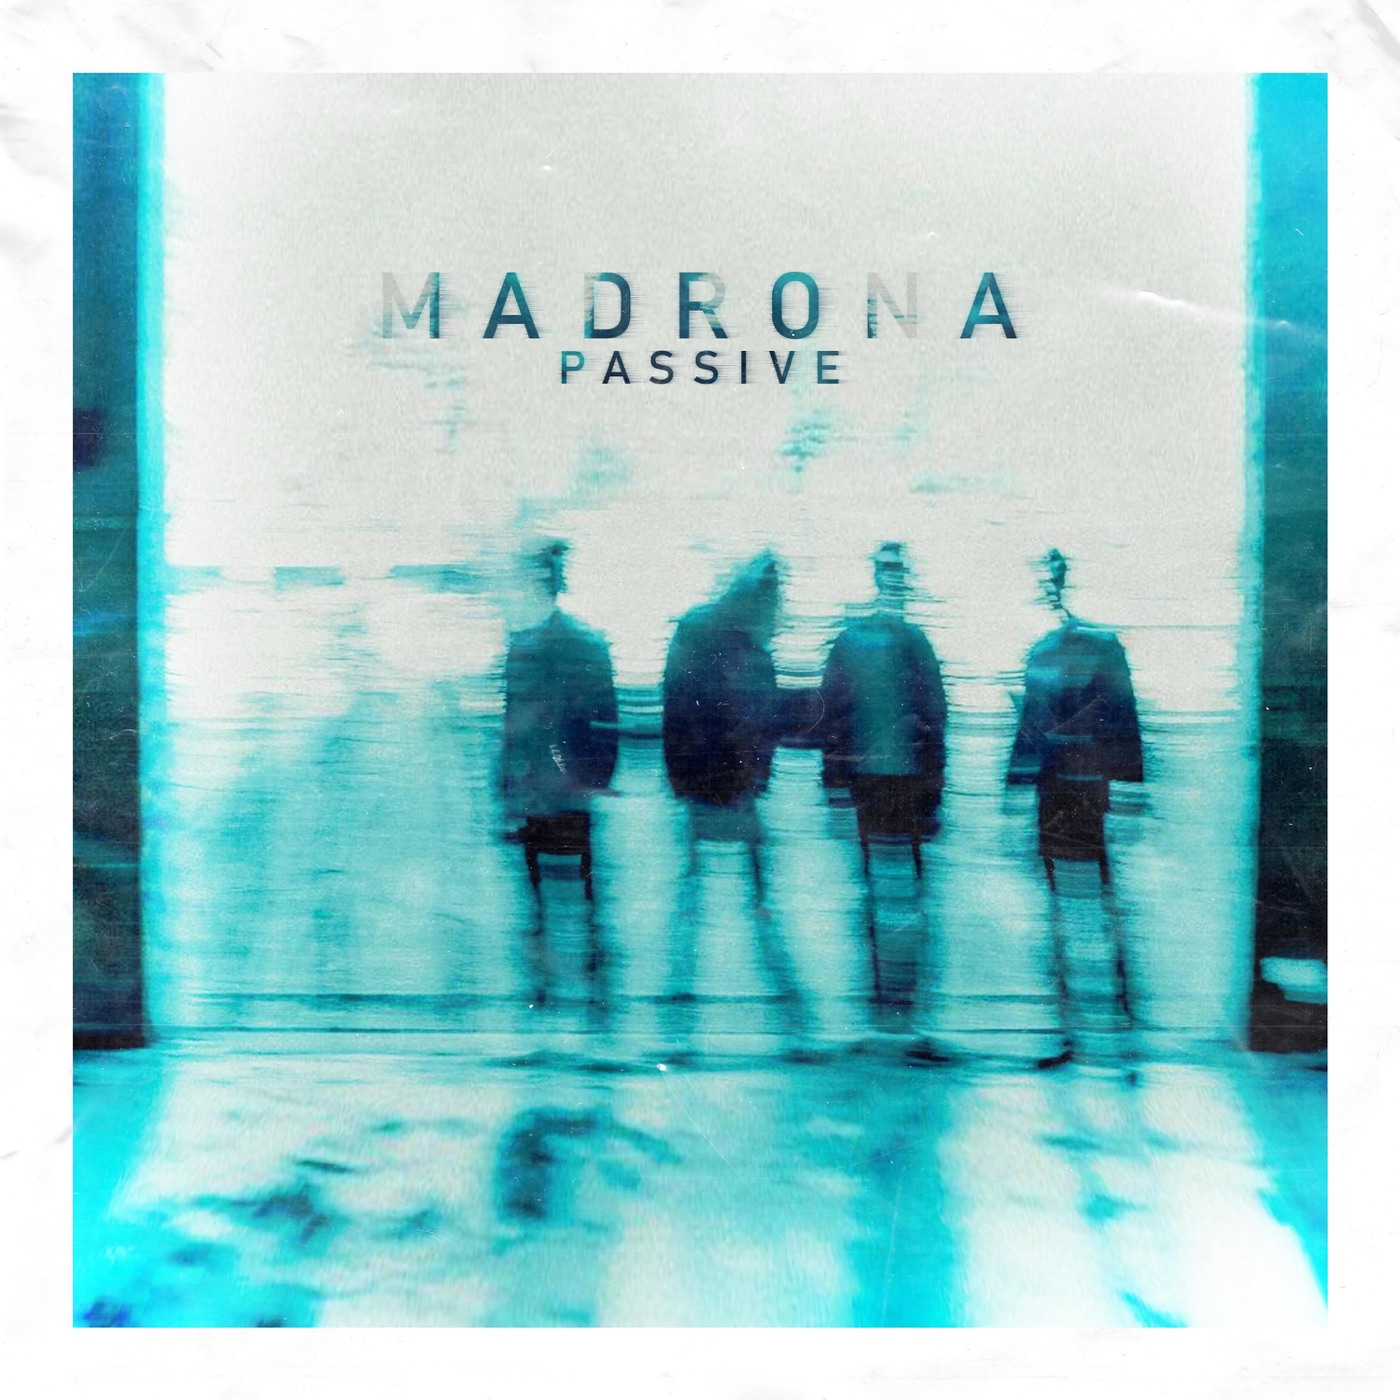 Madrona - Passive [EP] (2019)